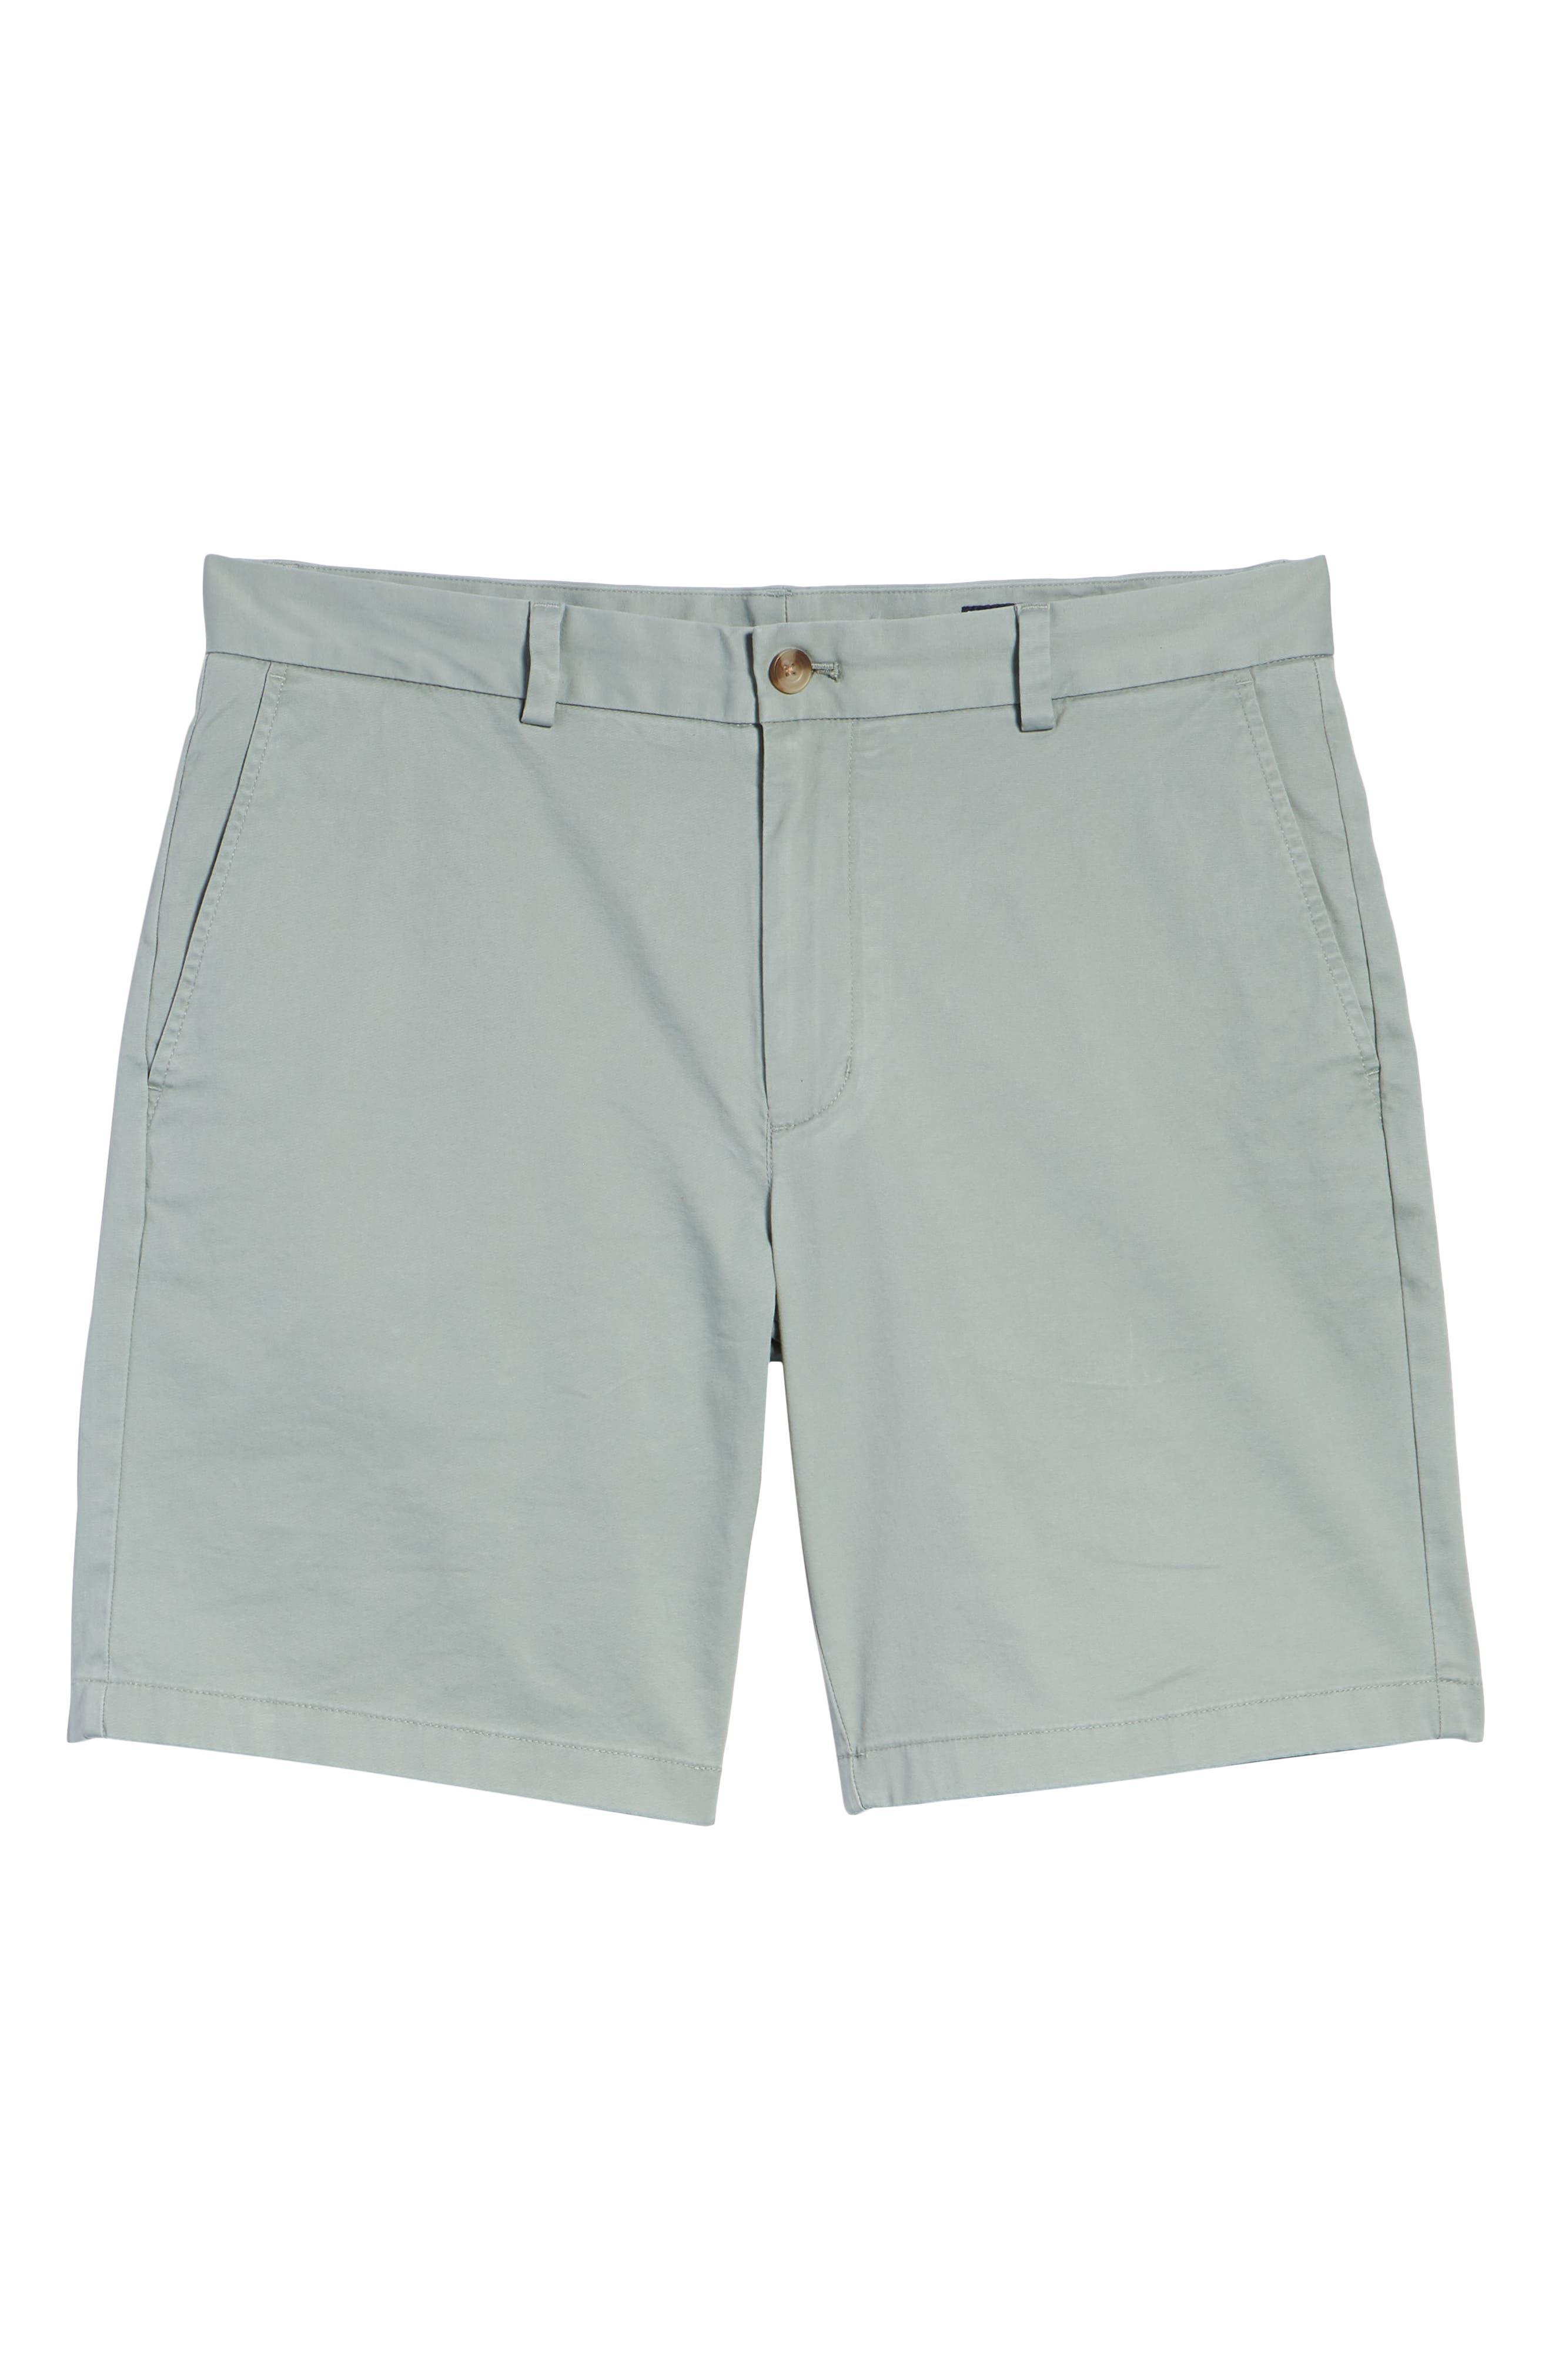 9 Inch Stretch Breaker Shorts,                             Alternate thumbnail 113, color,